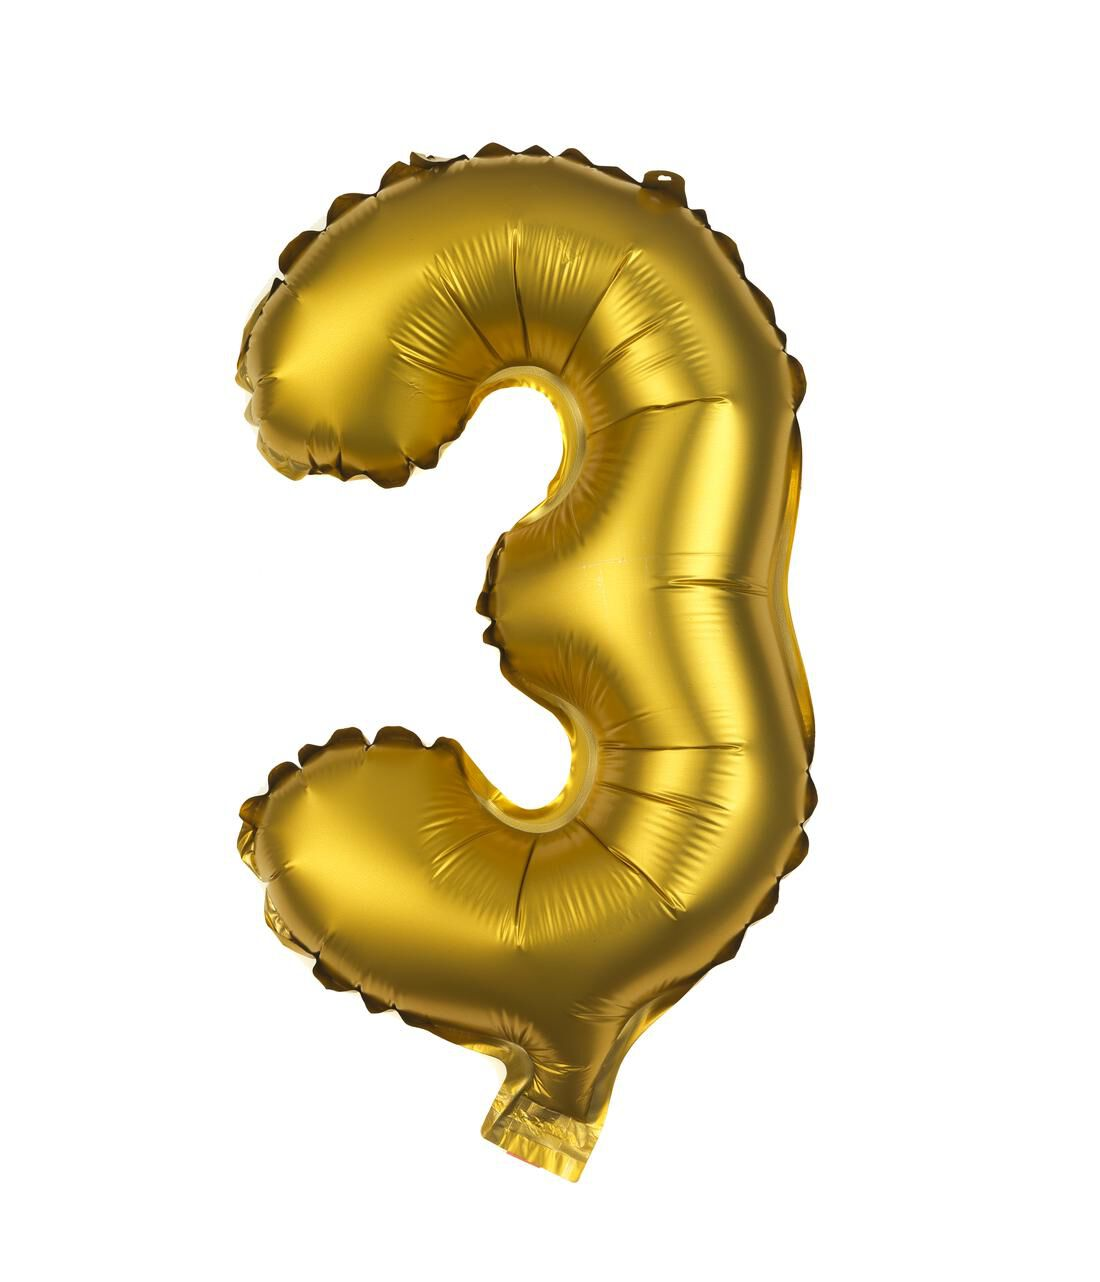 HEMA Folie Ballon 3 (goud)